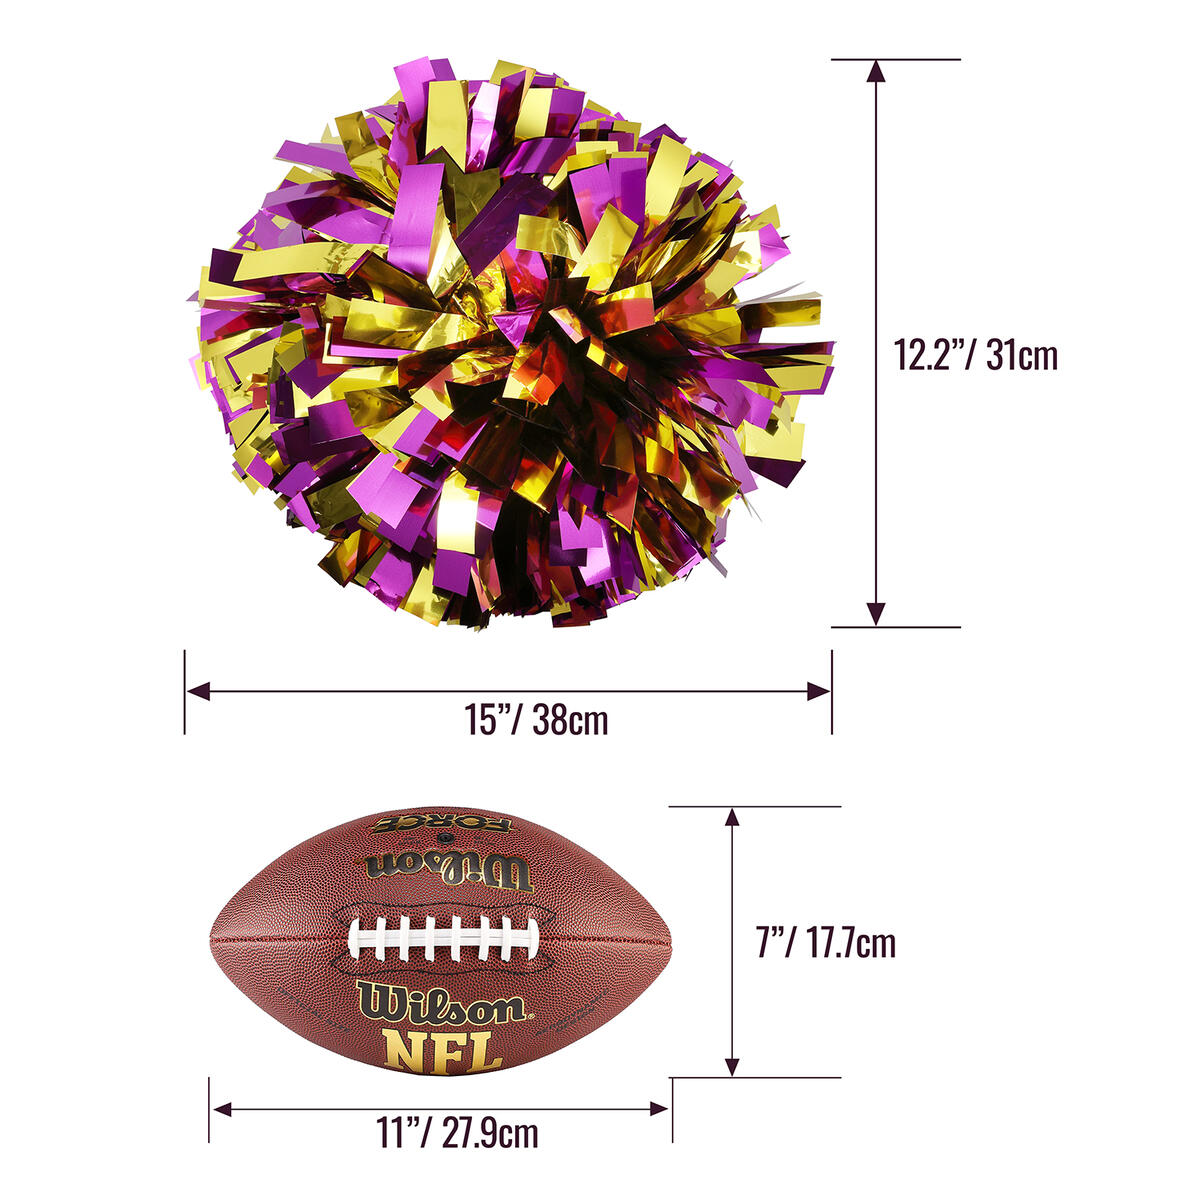 Metallic Pom Poms Cheerleading with Baton Handle and Holder (PINK)